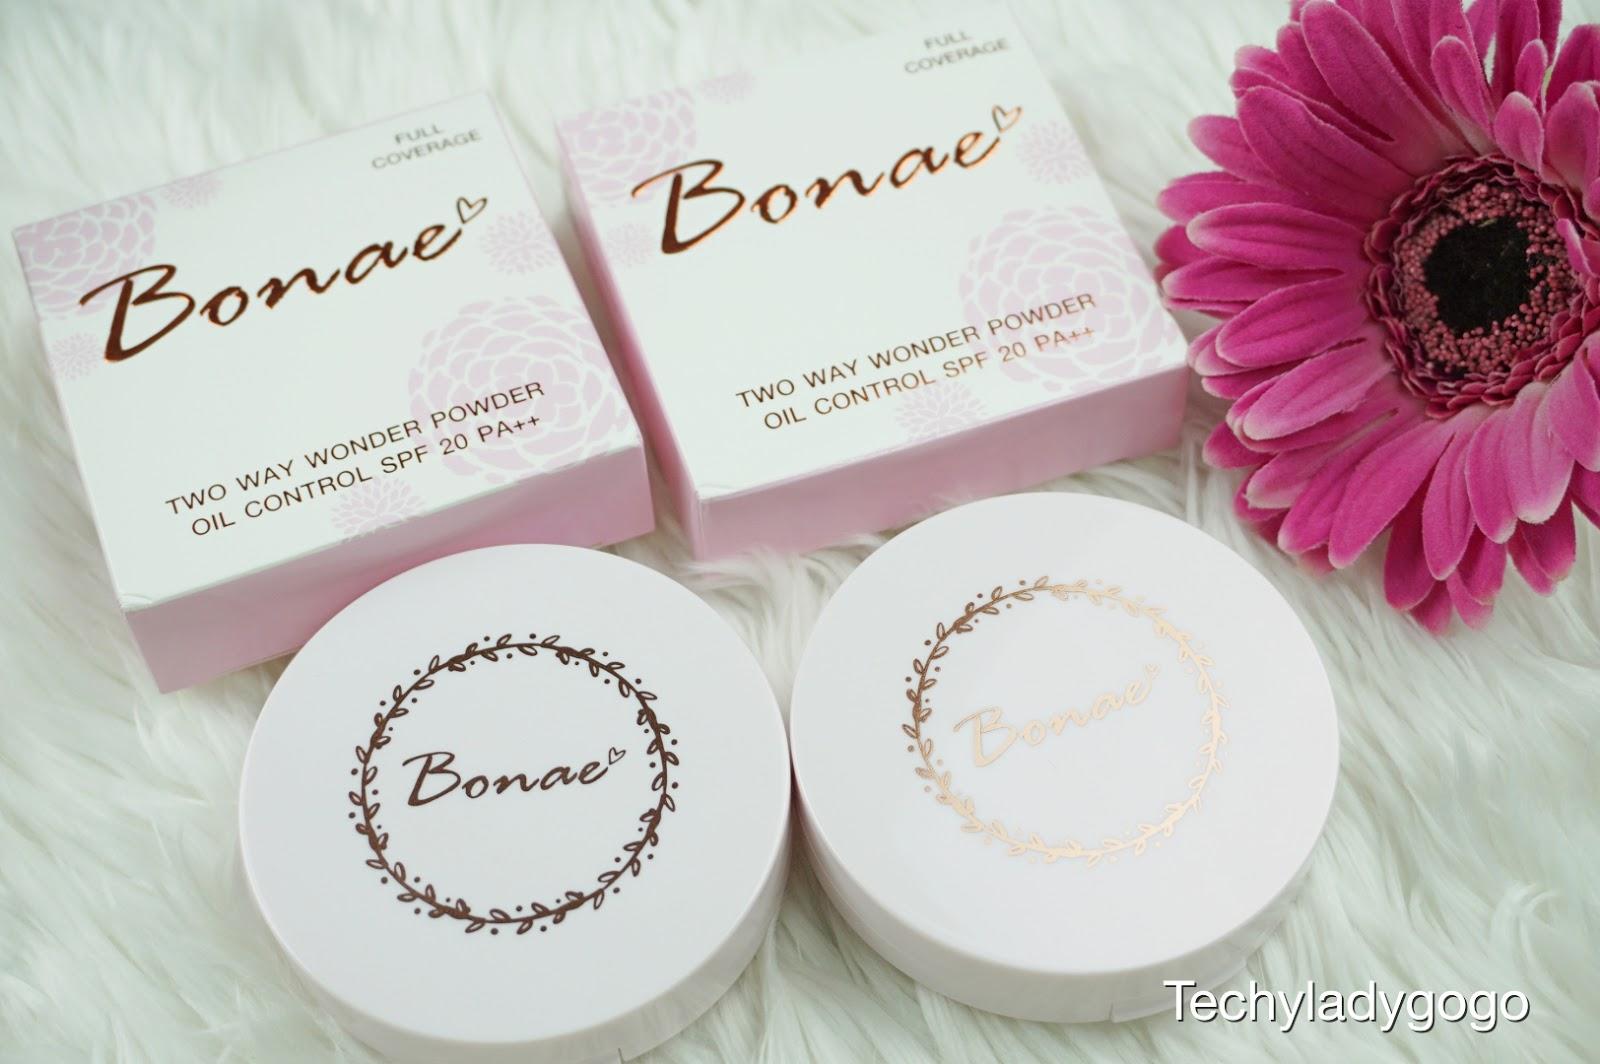 Bonae Two Way Wonder Powder SPF20 PA++ แป้งบอนเน่ ทูเวย์ วันเดอร์ พาวเดอร์ รีวิว แป้งคุมมัน แป้งรองพื้น แป้งพัฟ แป้งคนไทย แป้งปกปิด Full Coverage